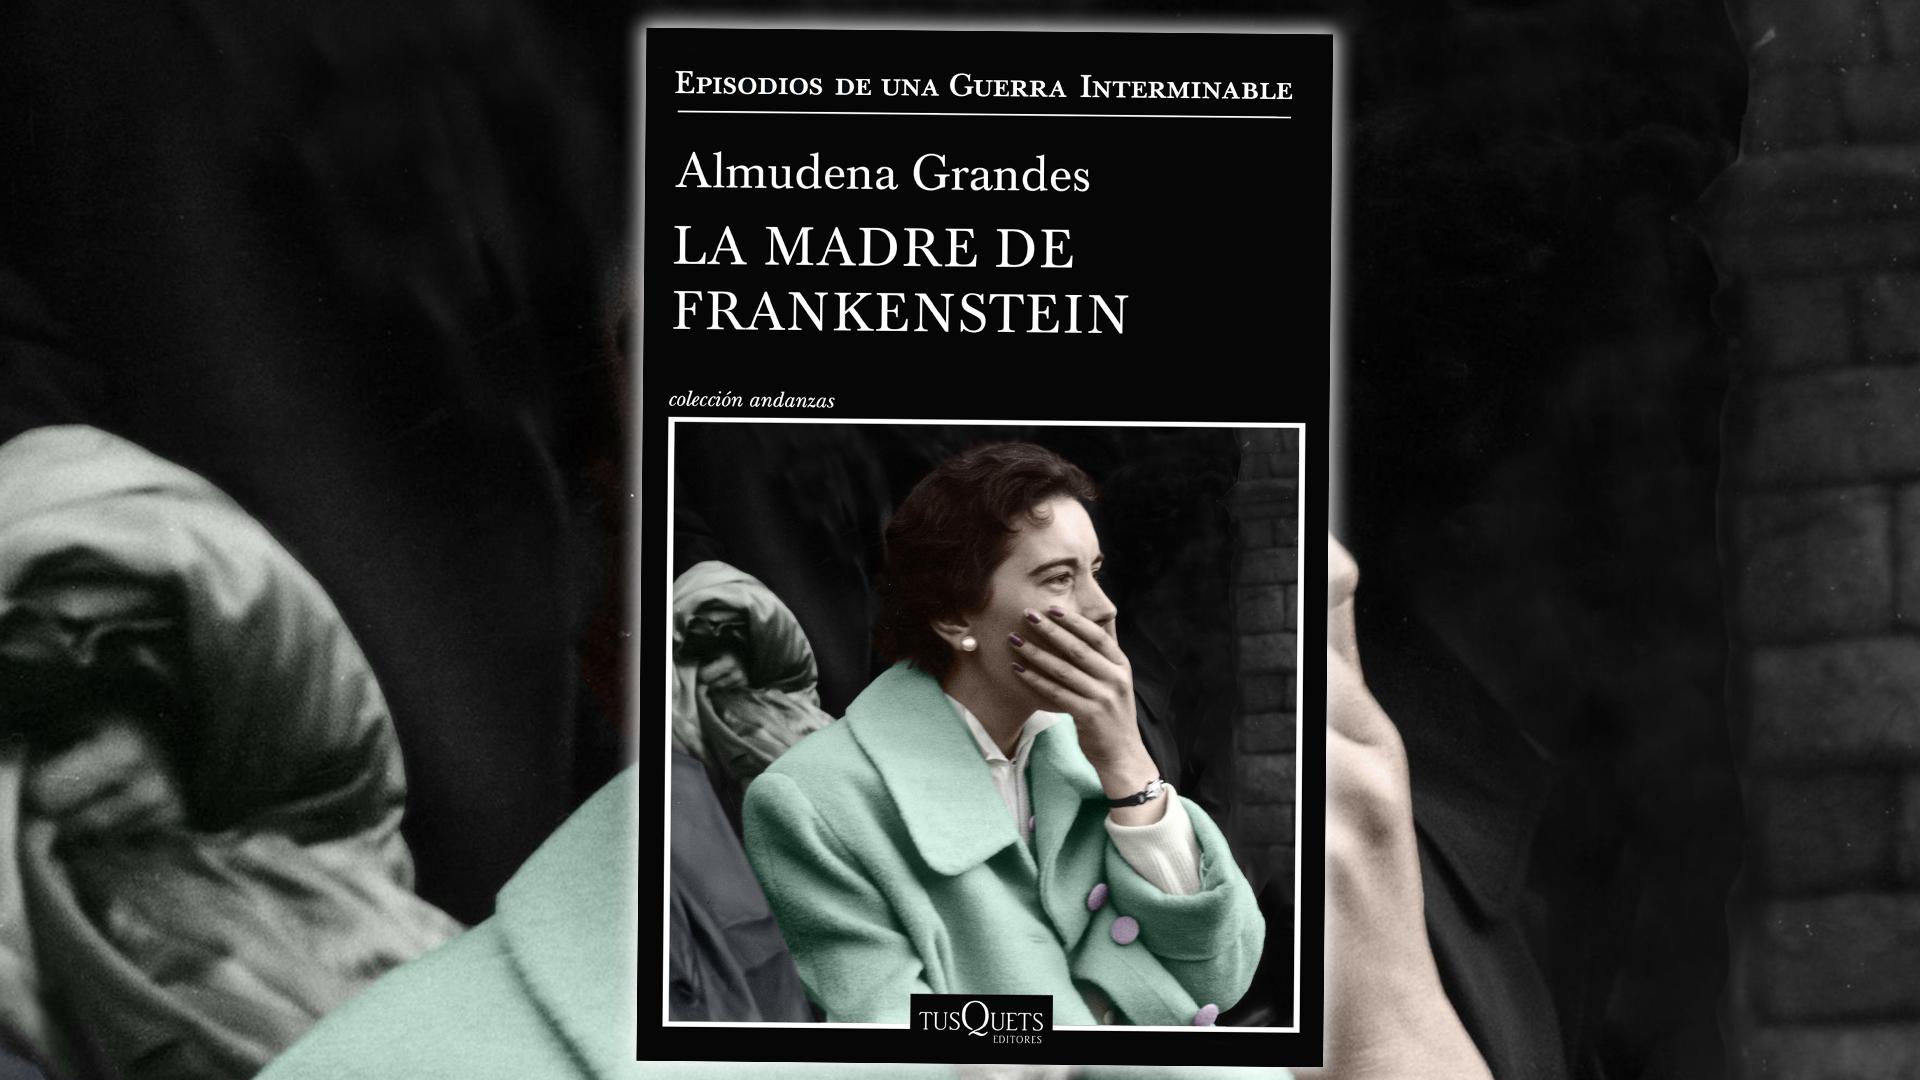 La-Madre-de-Frankenstein-Almudena-Negro-Web-Up